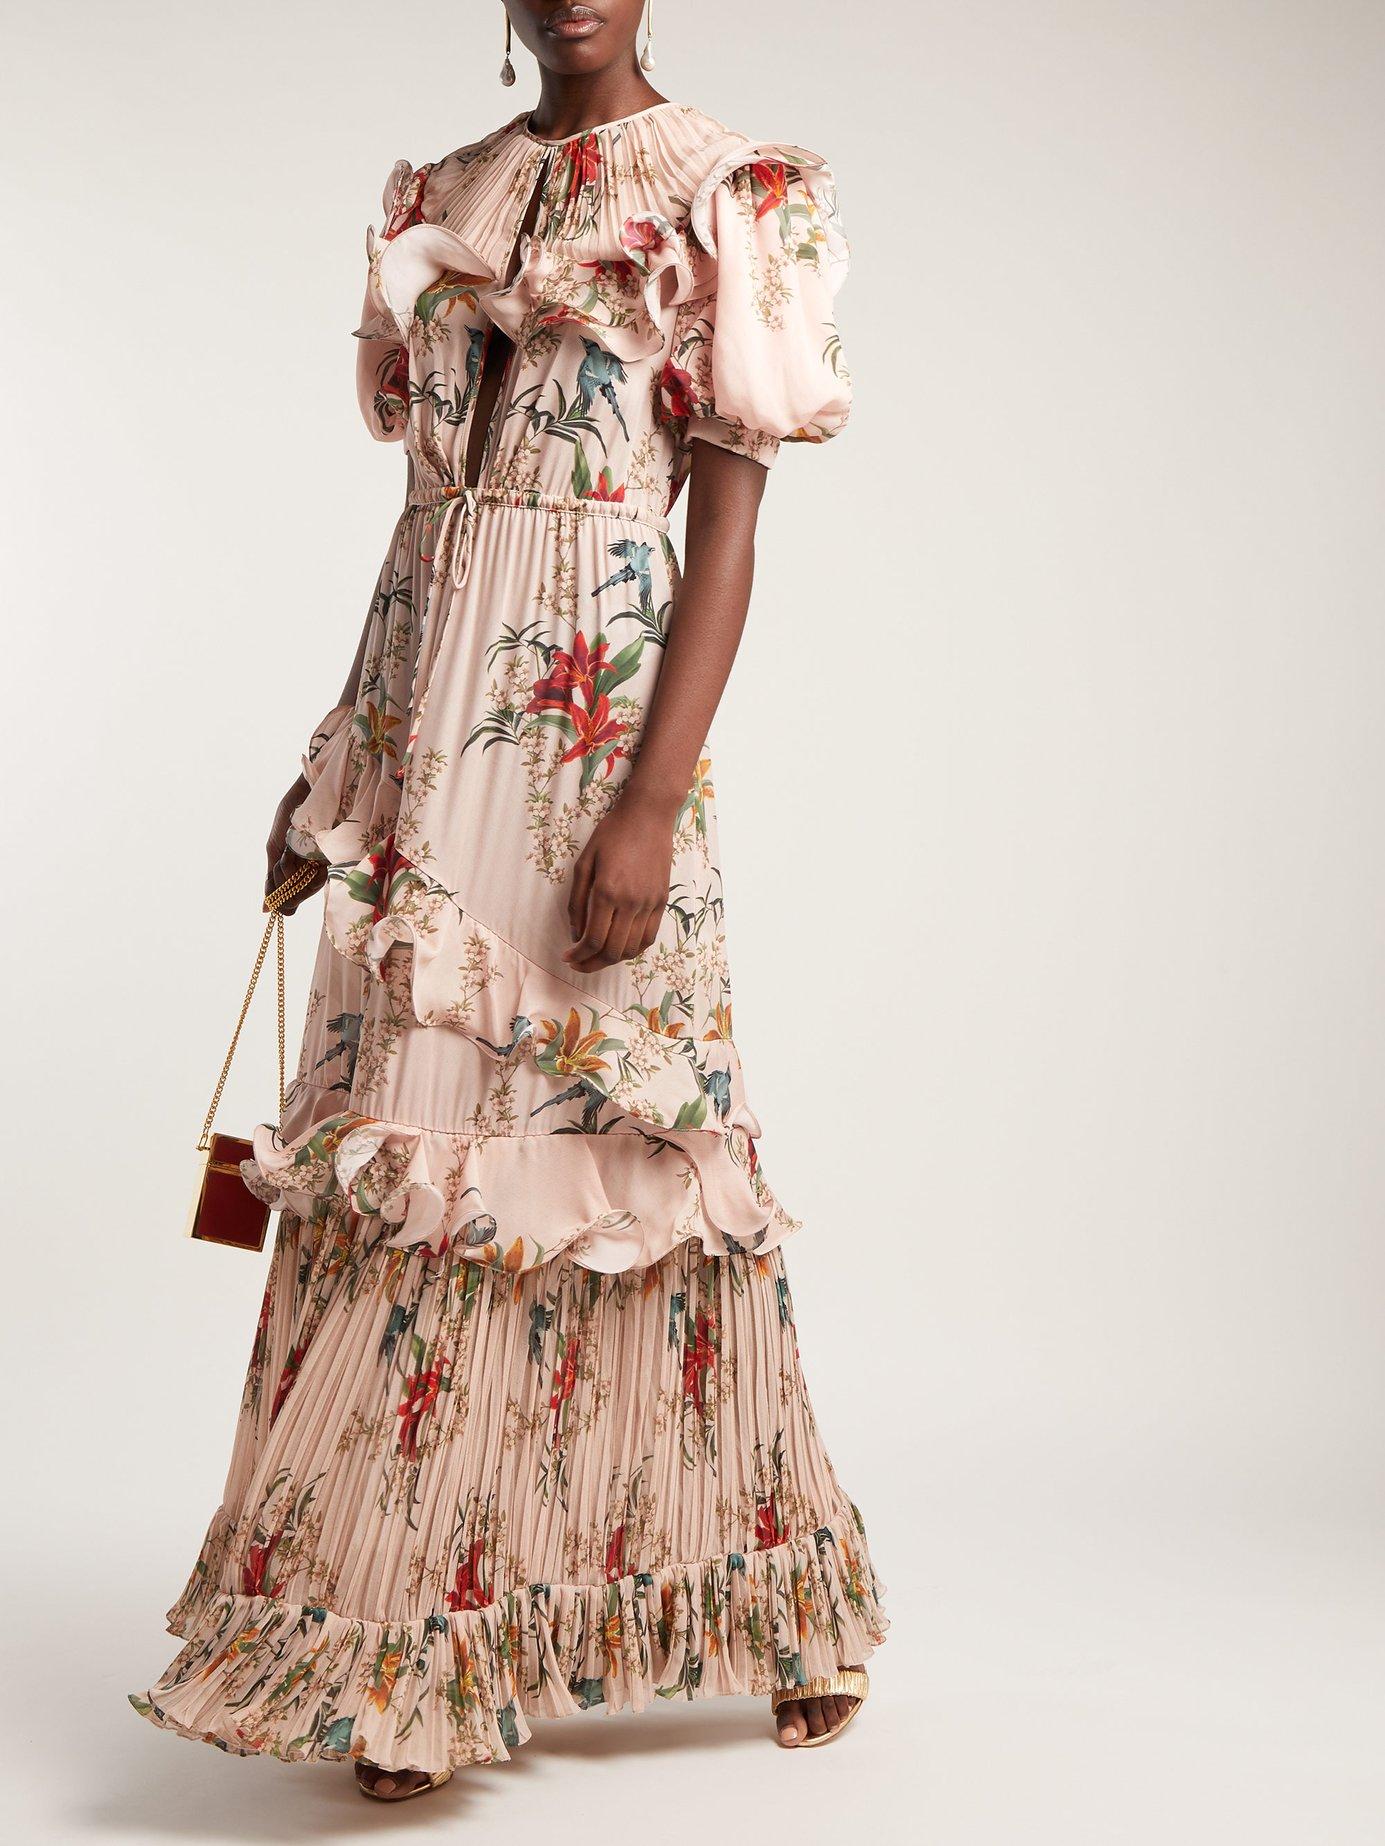 Queen of Sheeba dress by Johanna Ortiz